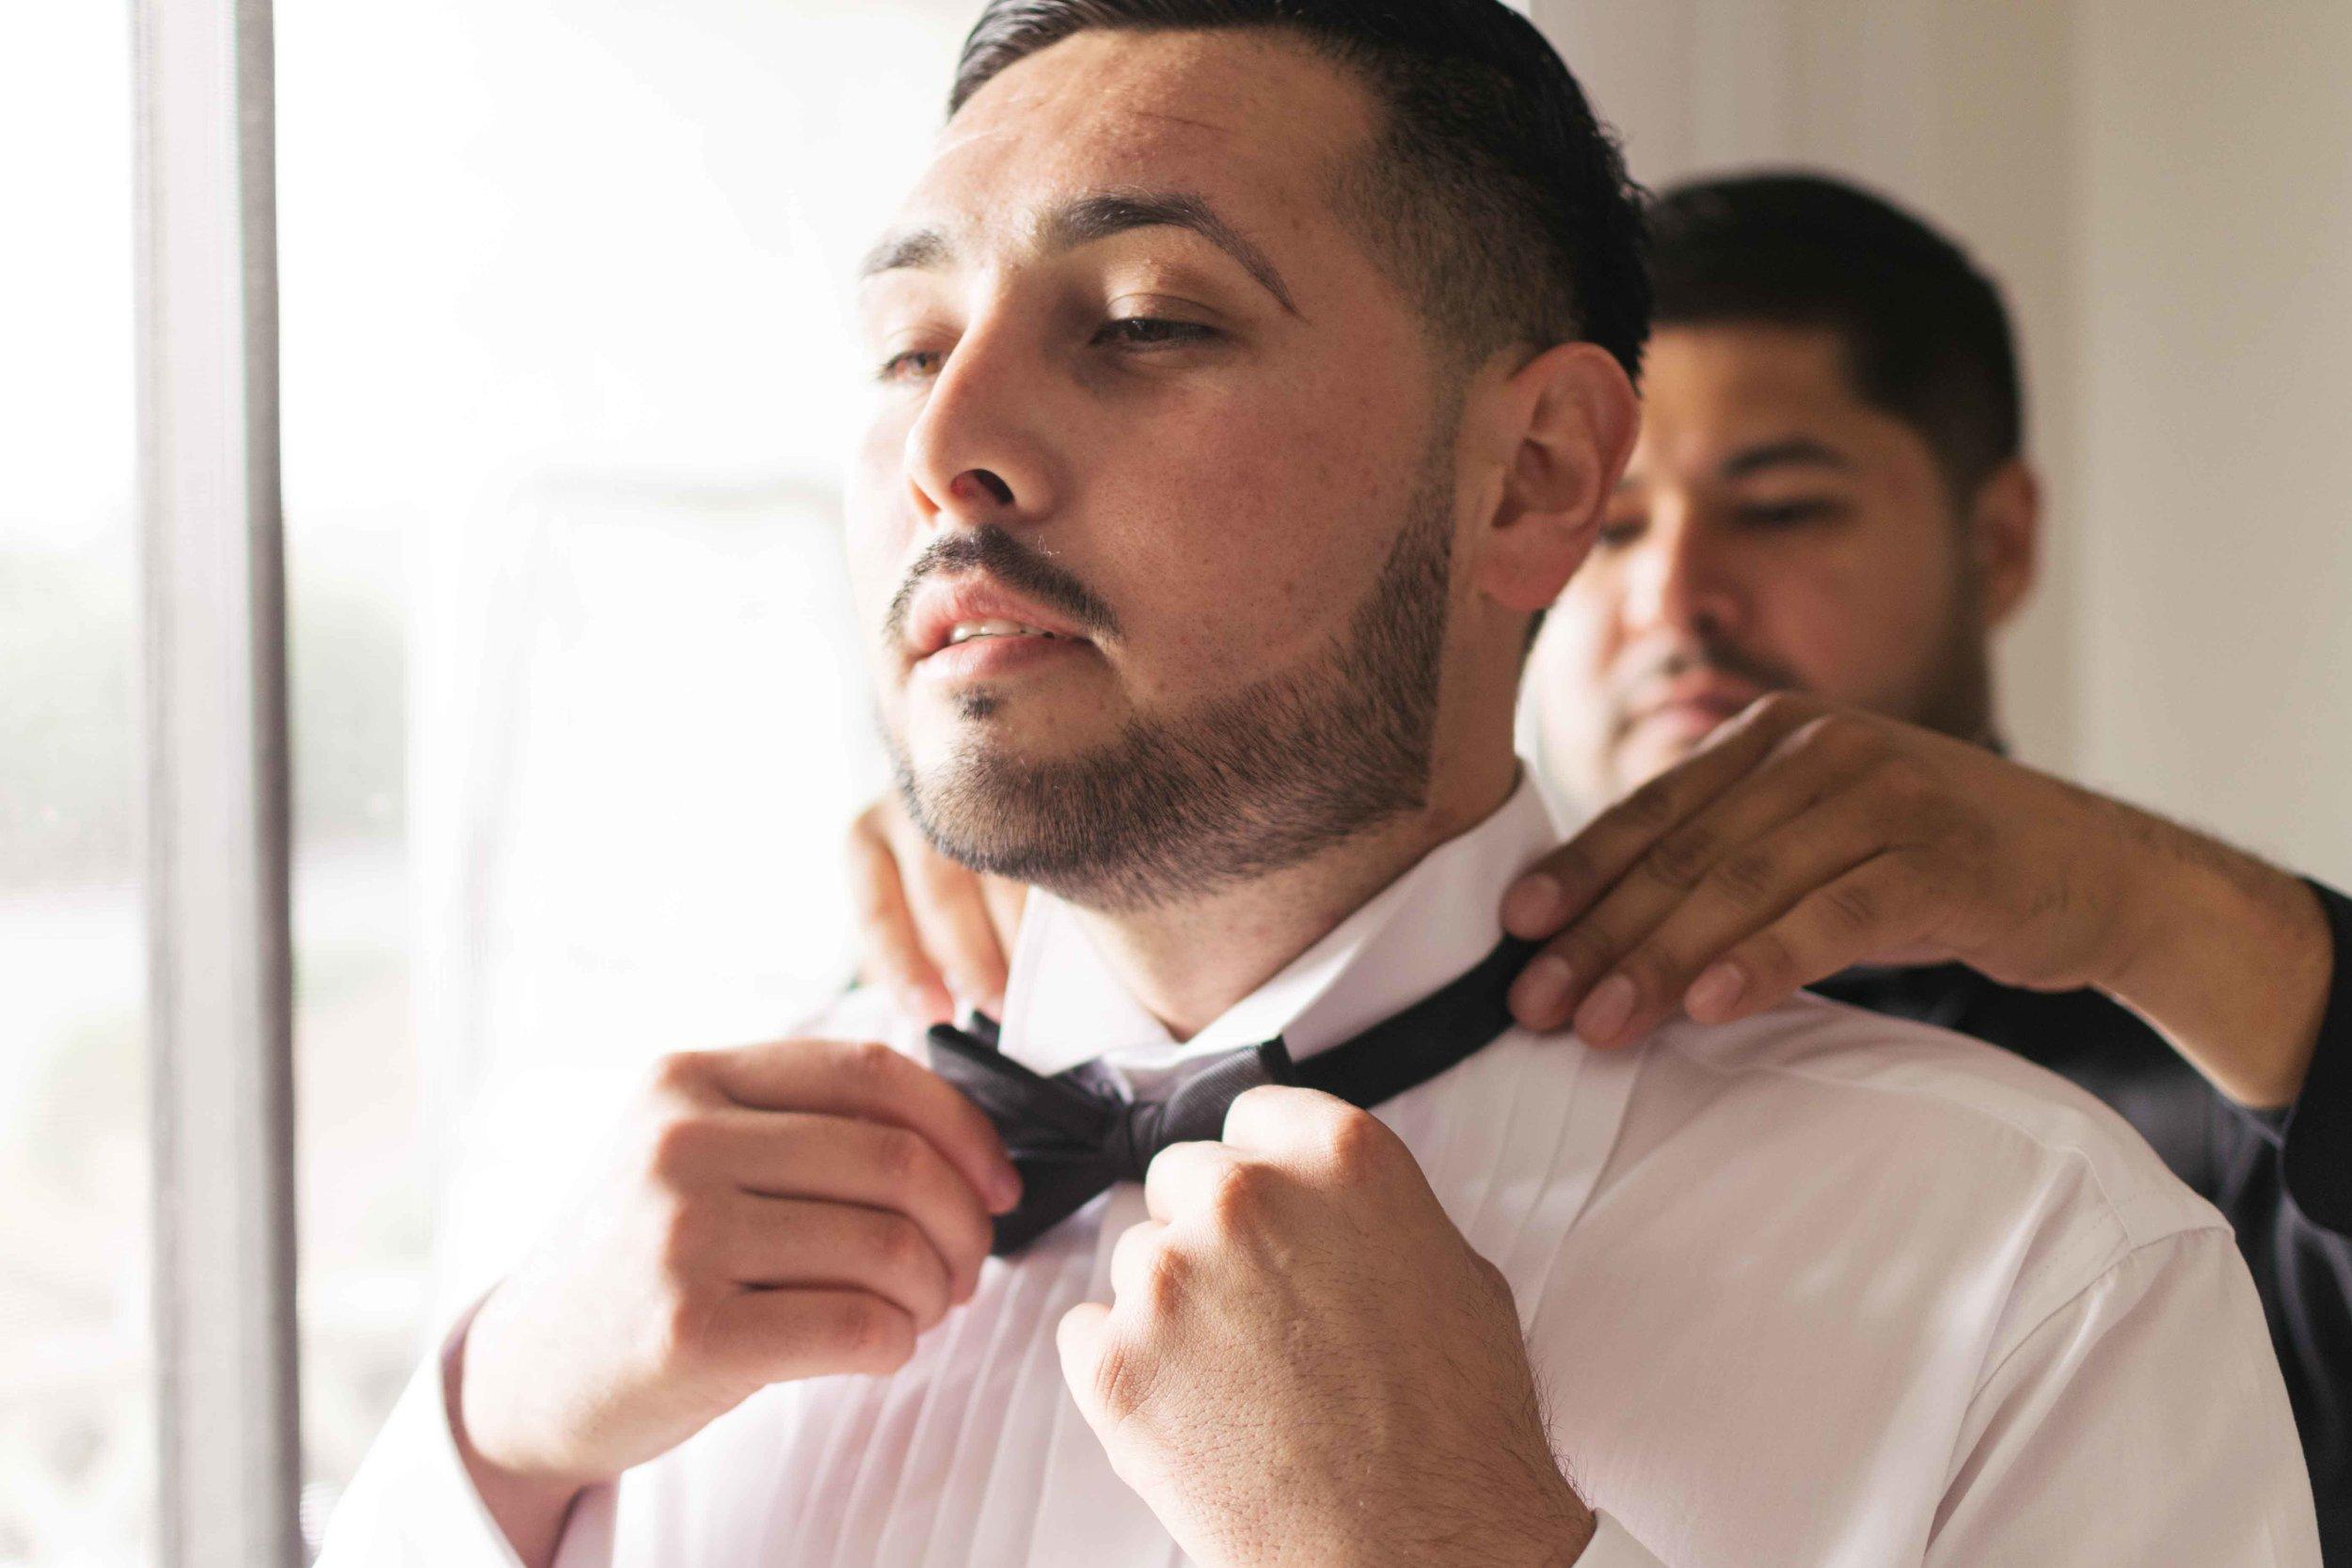 san-juan-bautista-photographer-tony-monse-wedding-36.JPG